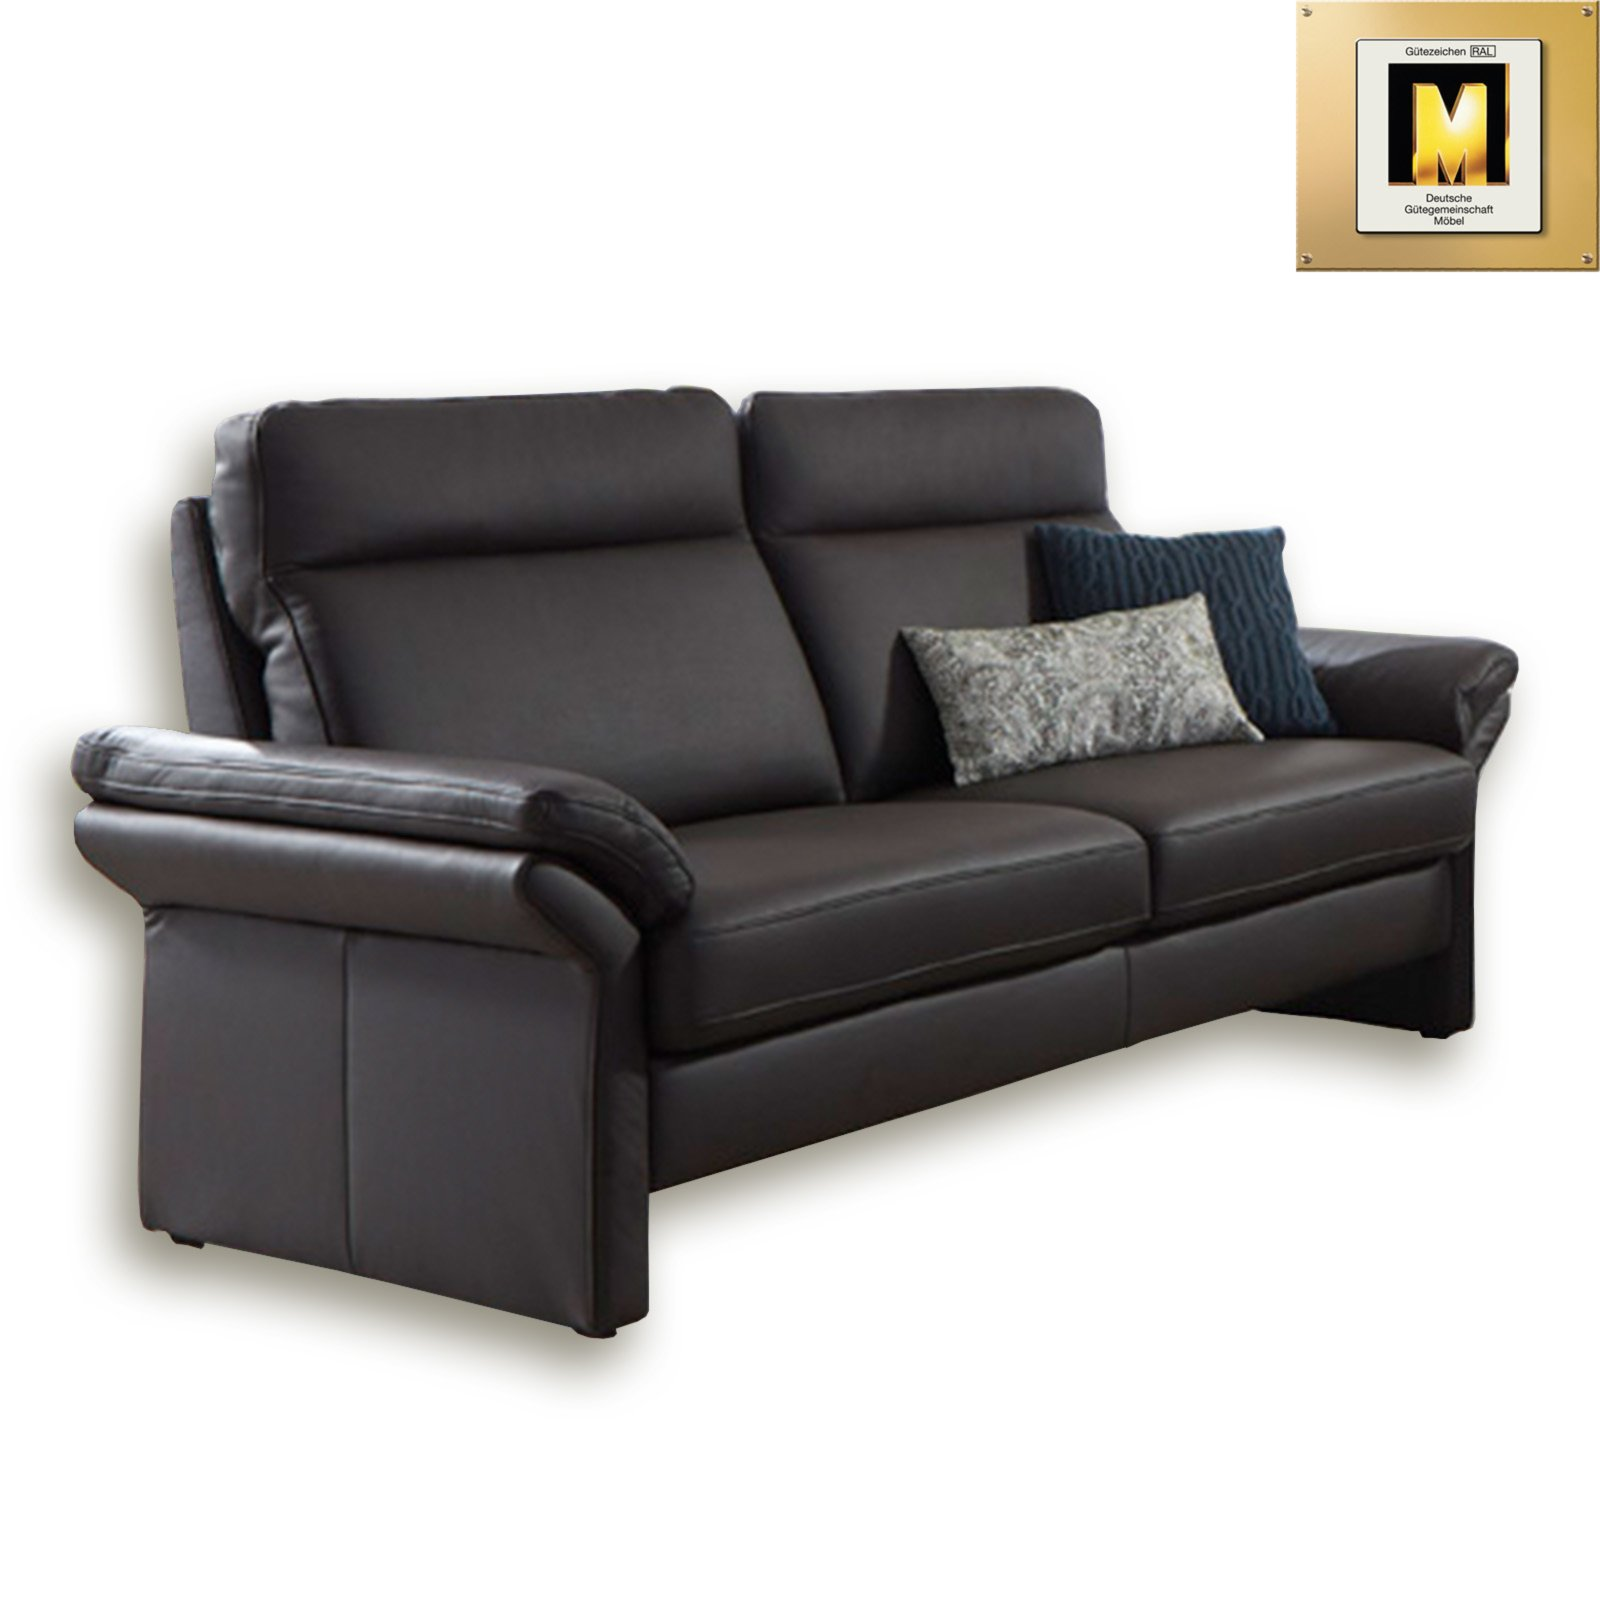 3 sitzer ledersofa braun federkern move funktion polstergarnitur braun federkern. Black Bedroom Furniture Sets. Home Design Ideas